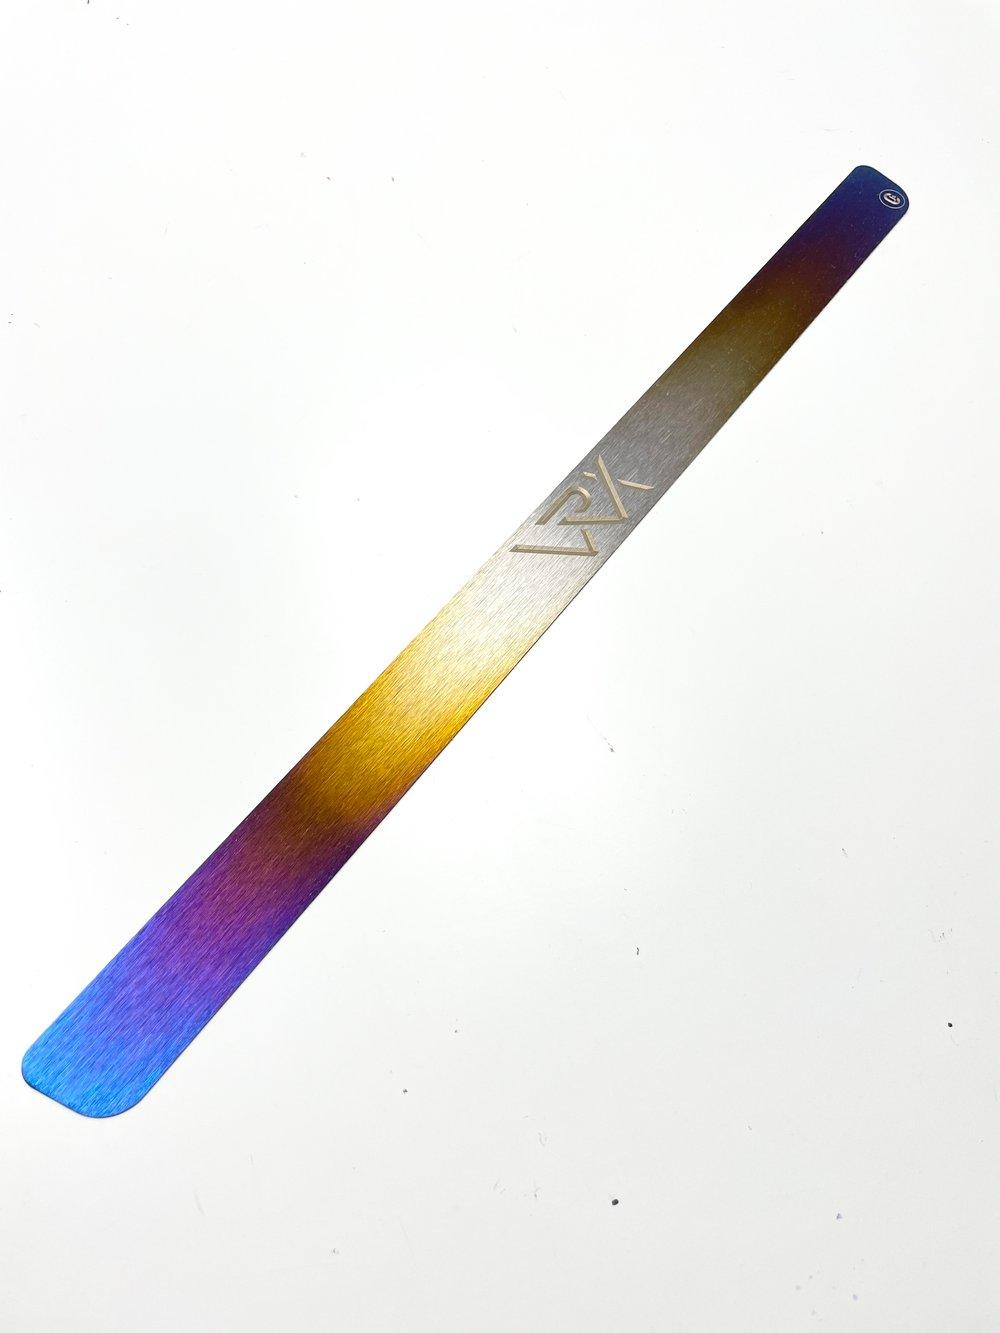 08-14 Subaru STi titanium door sills